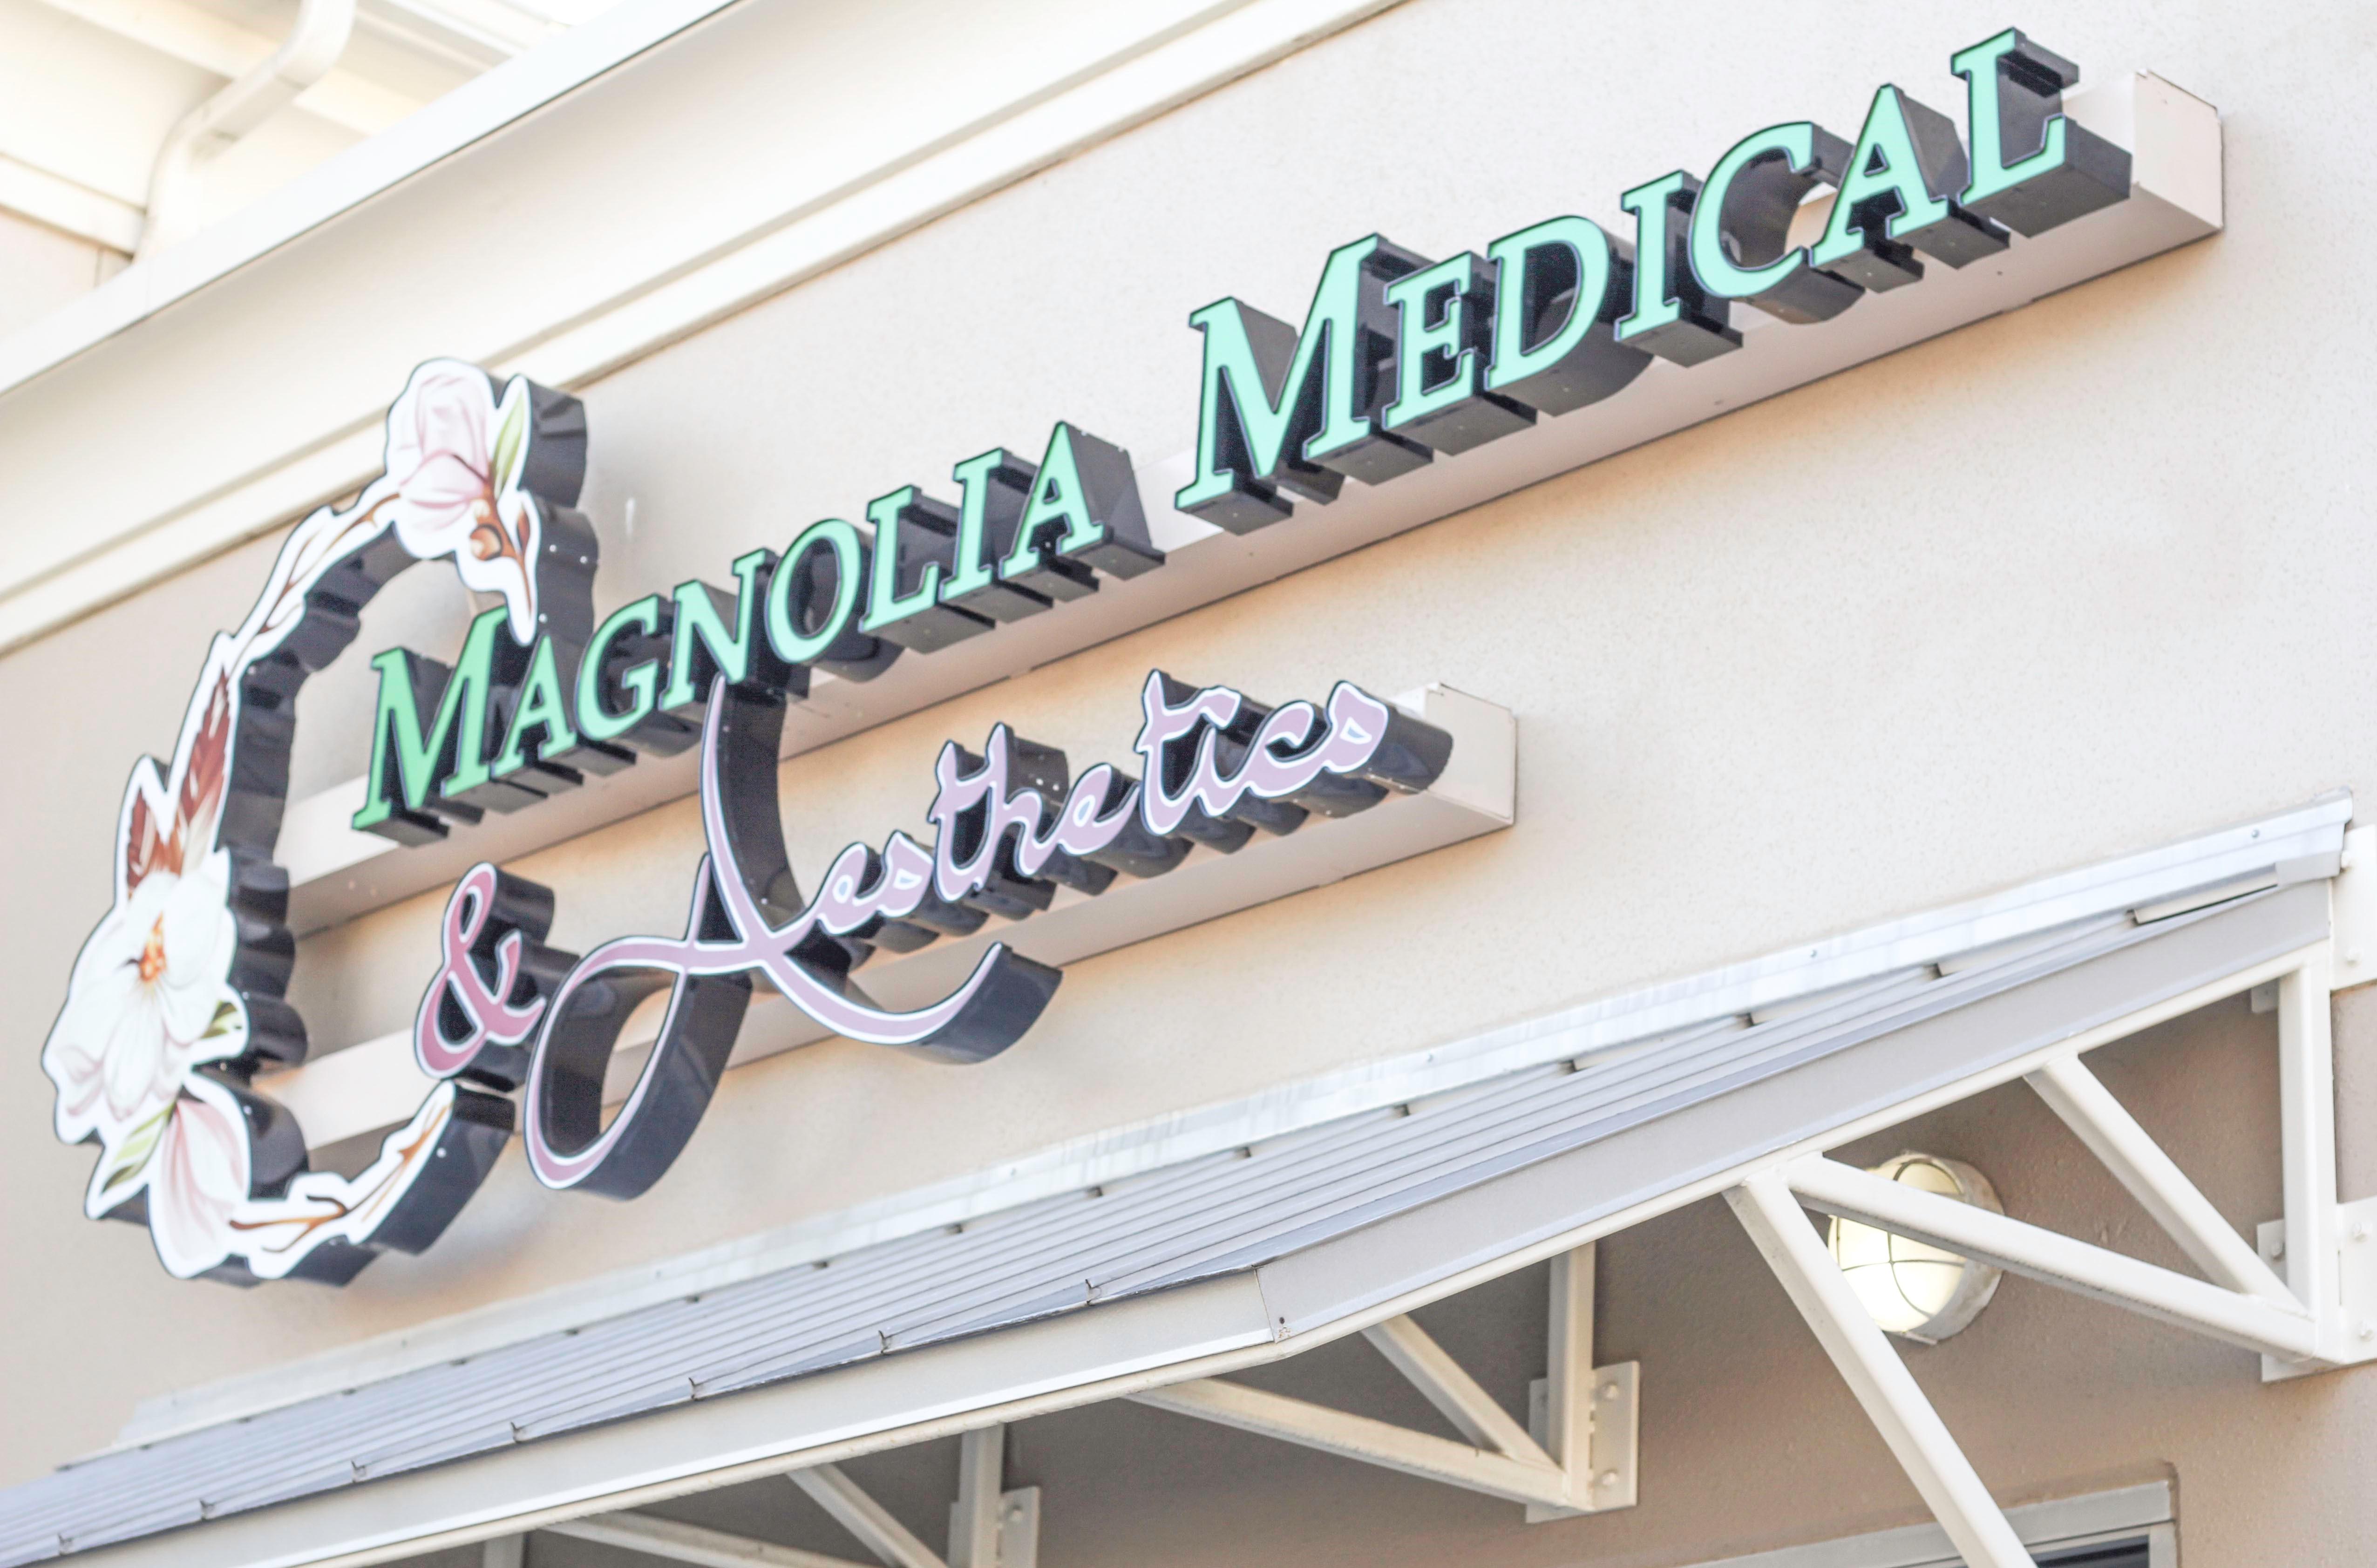 Magnolia Medical & Aesthetics image 15